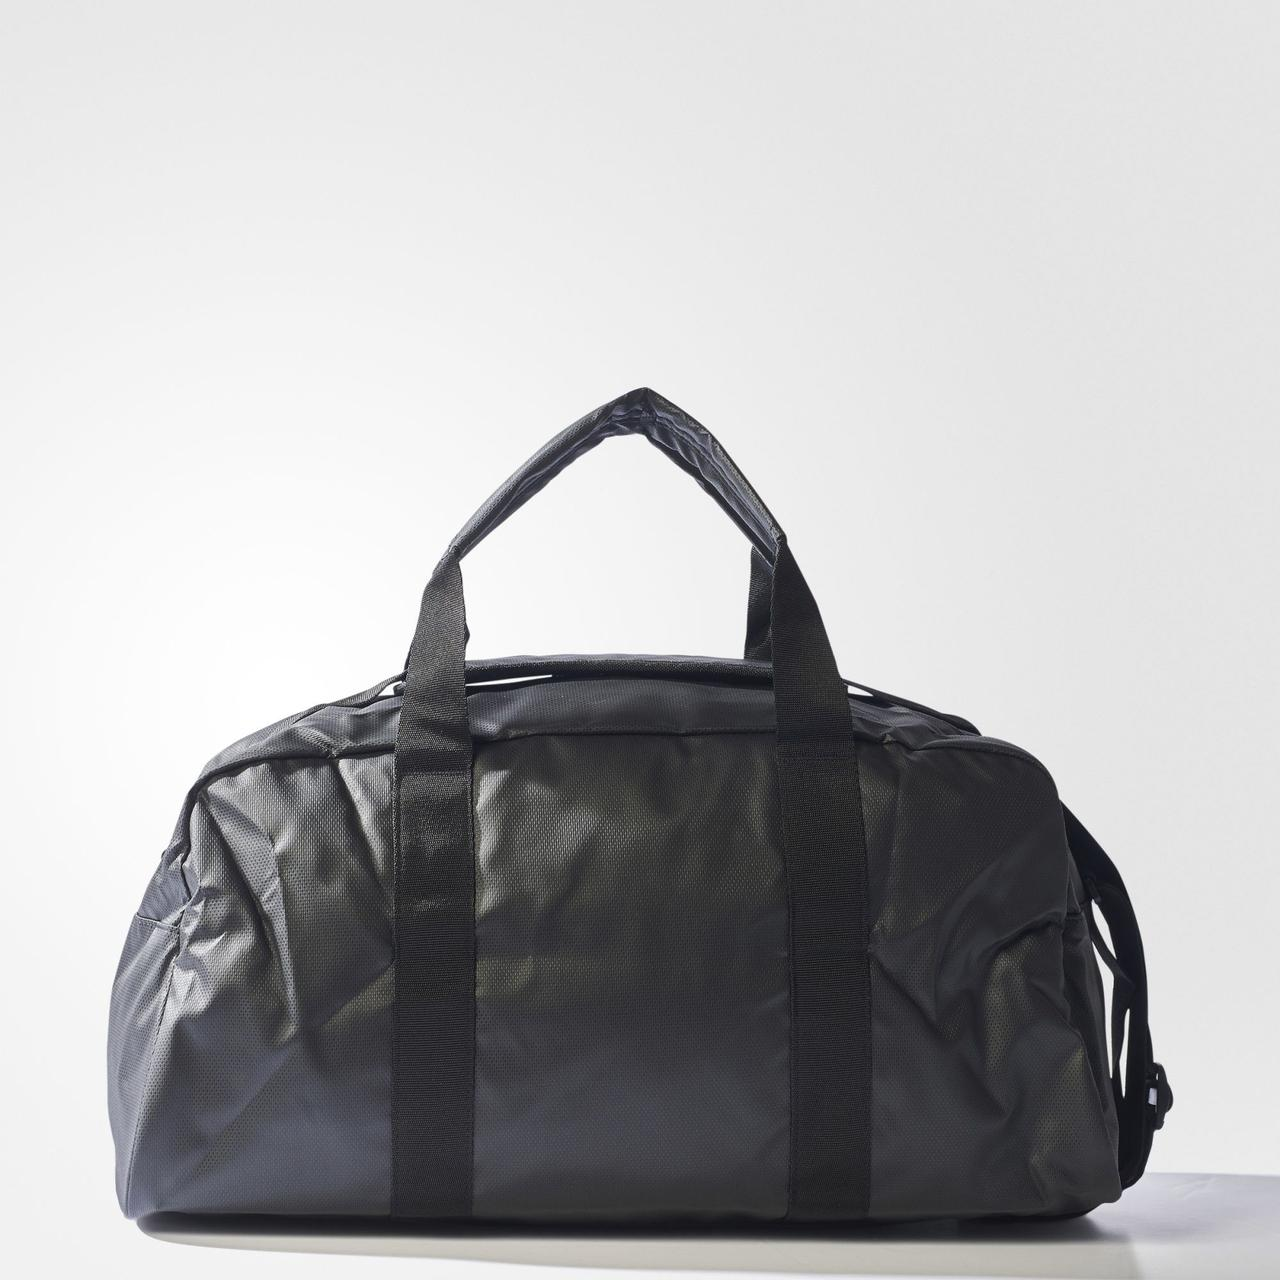 2dd62ce206c5 Спортивная сумка Adidas Climacool: продажа, цена в Харькове ...